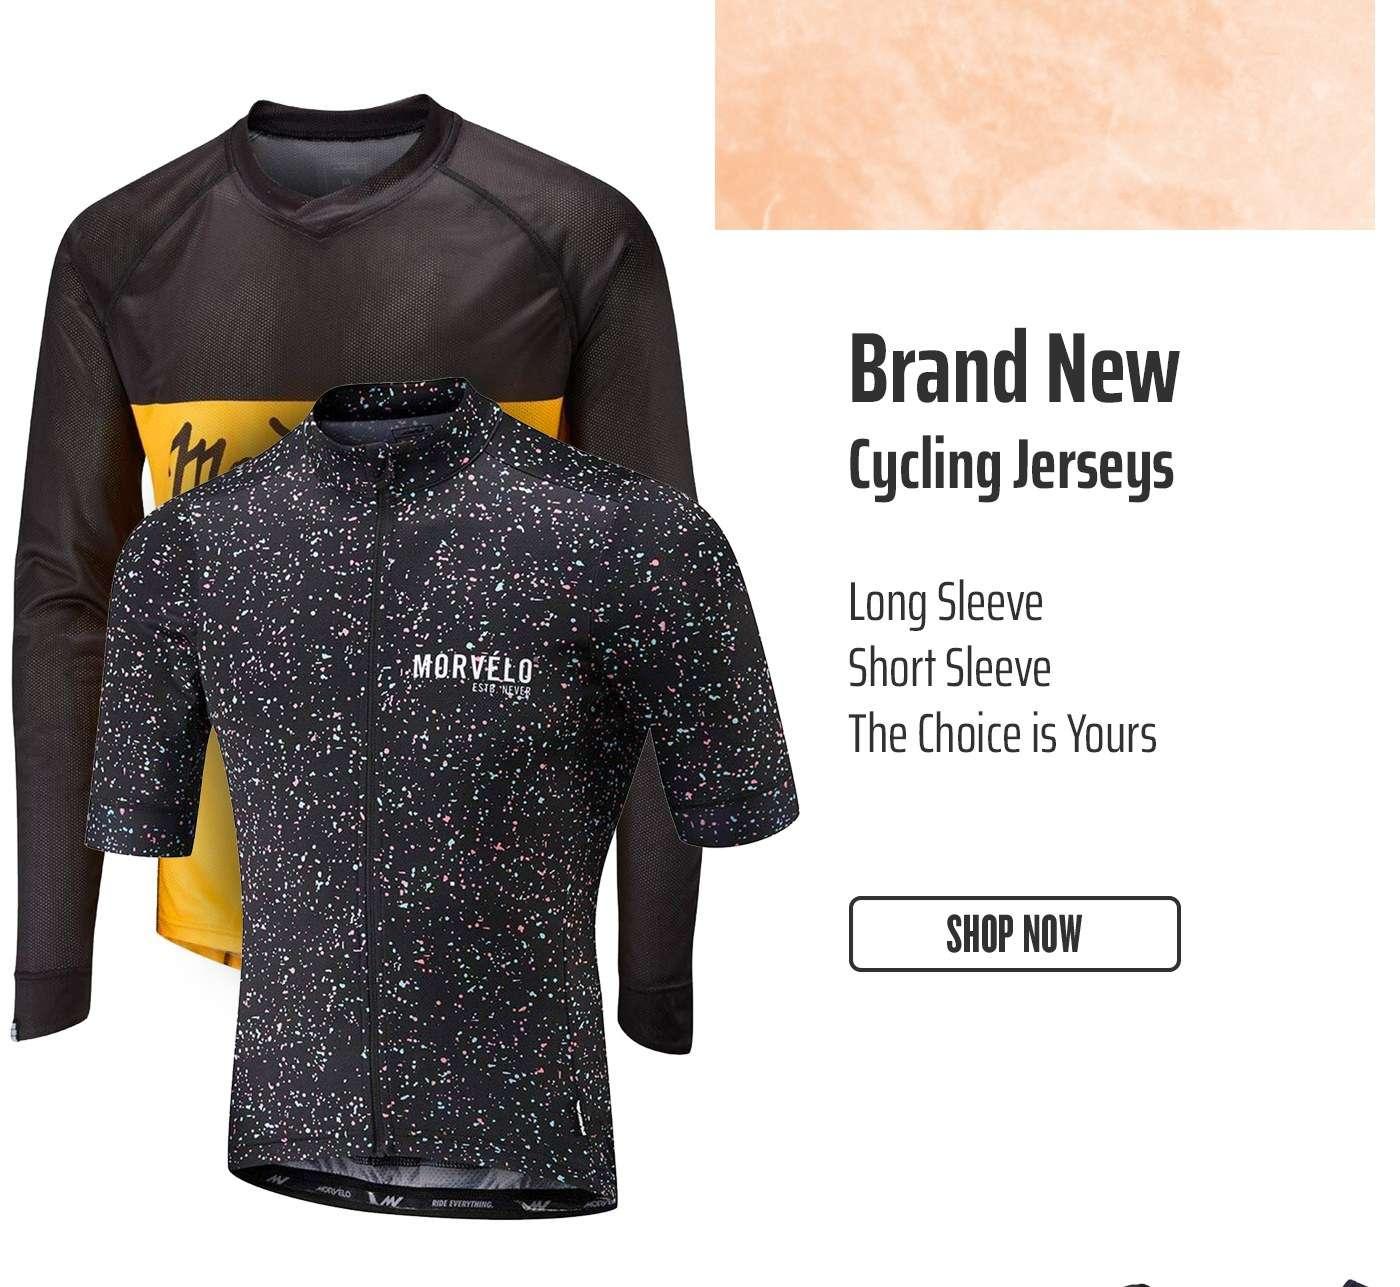 Brand New Cycling Jerseys